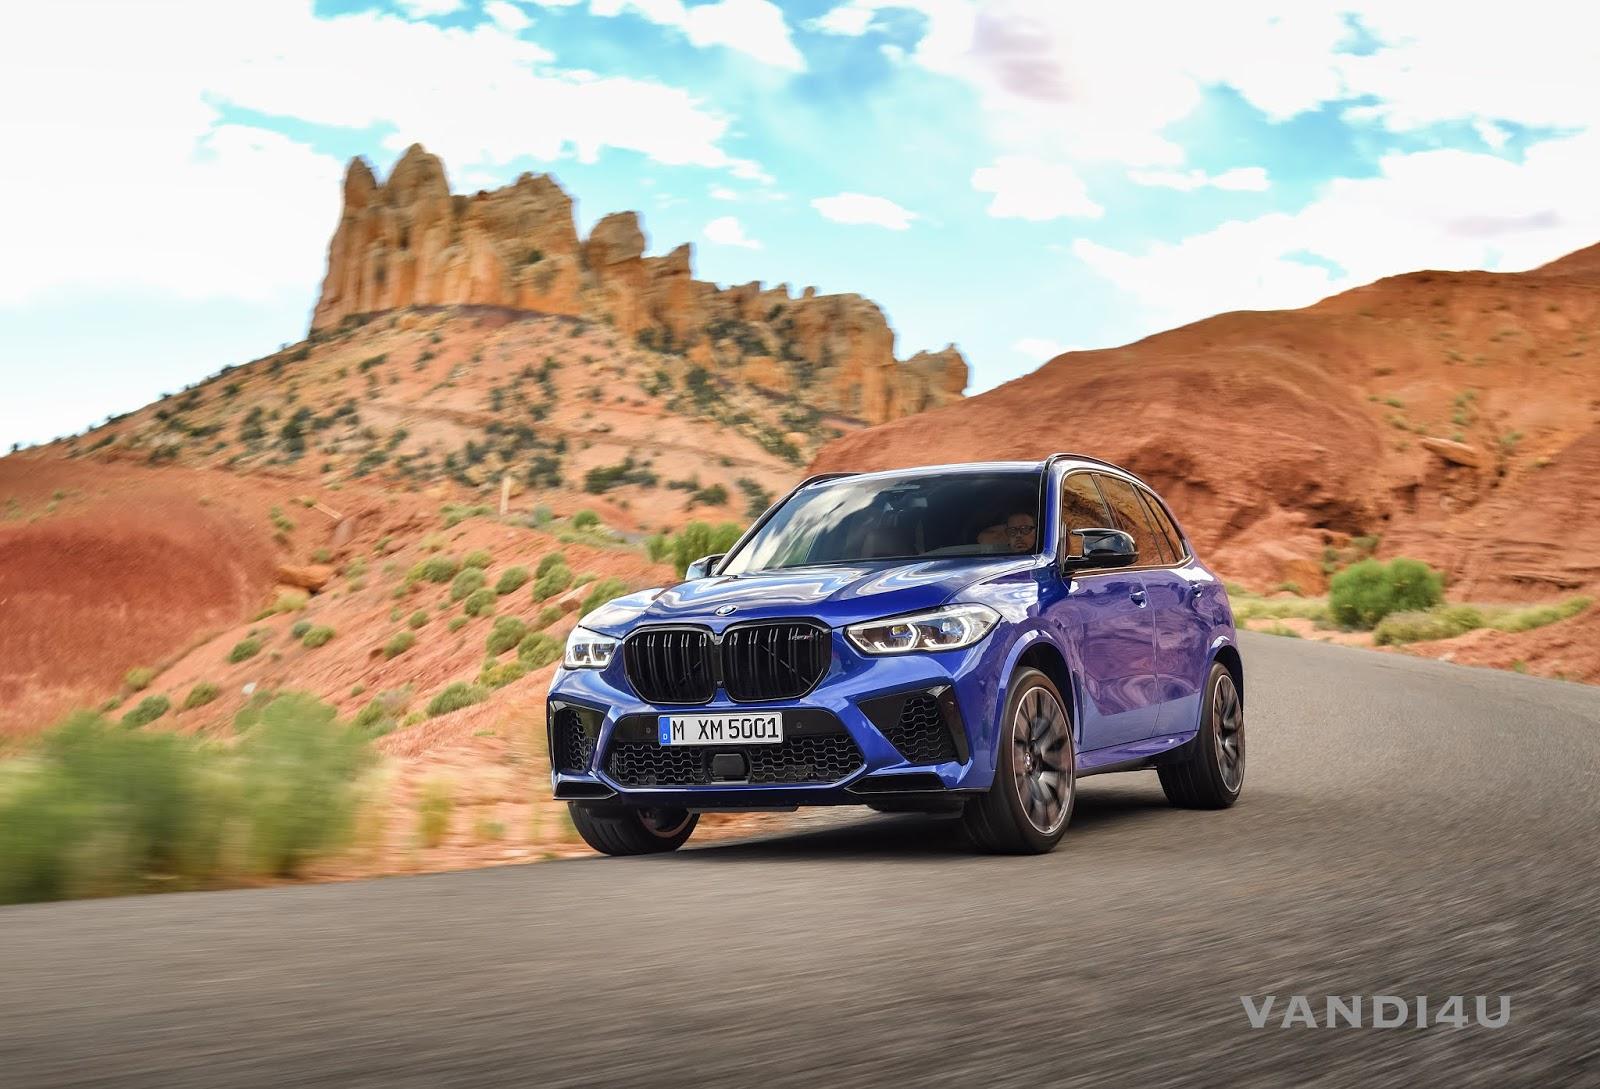 2020 BMW X5 M revealed: Top things to know   VANDI4U